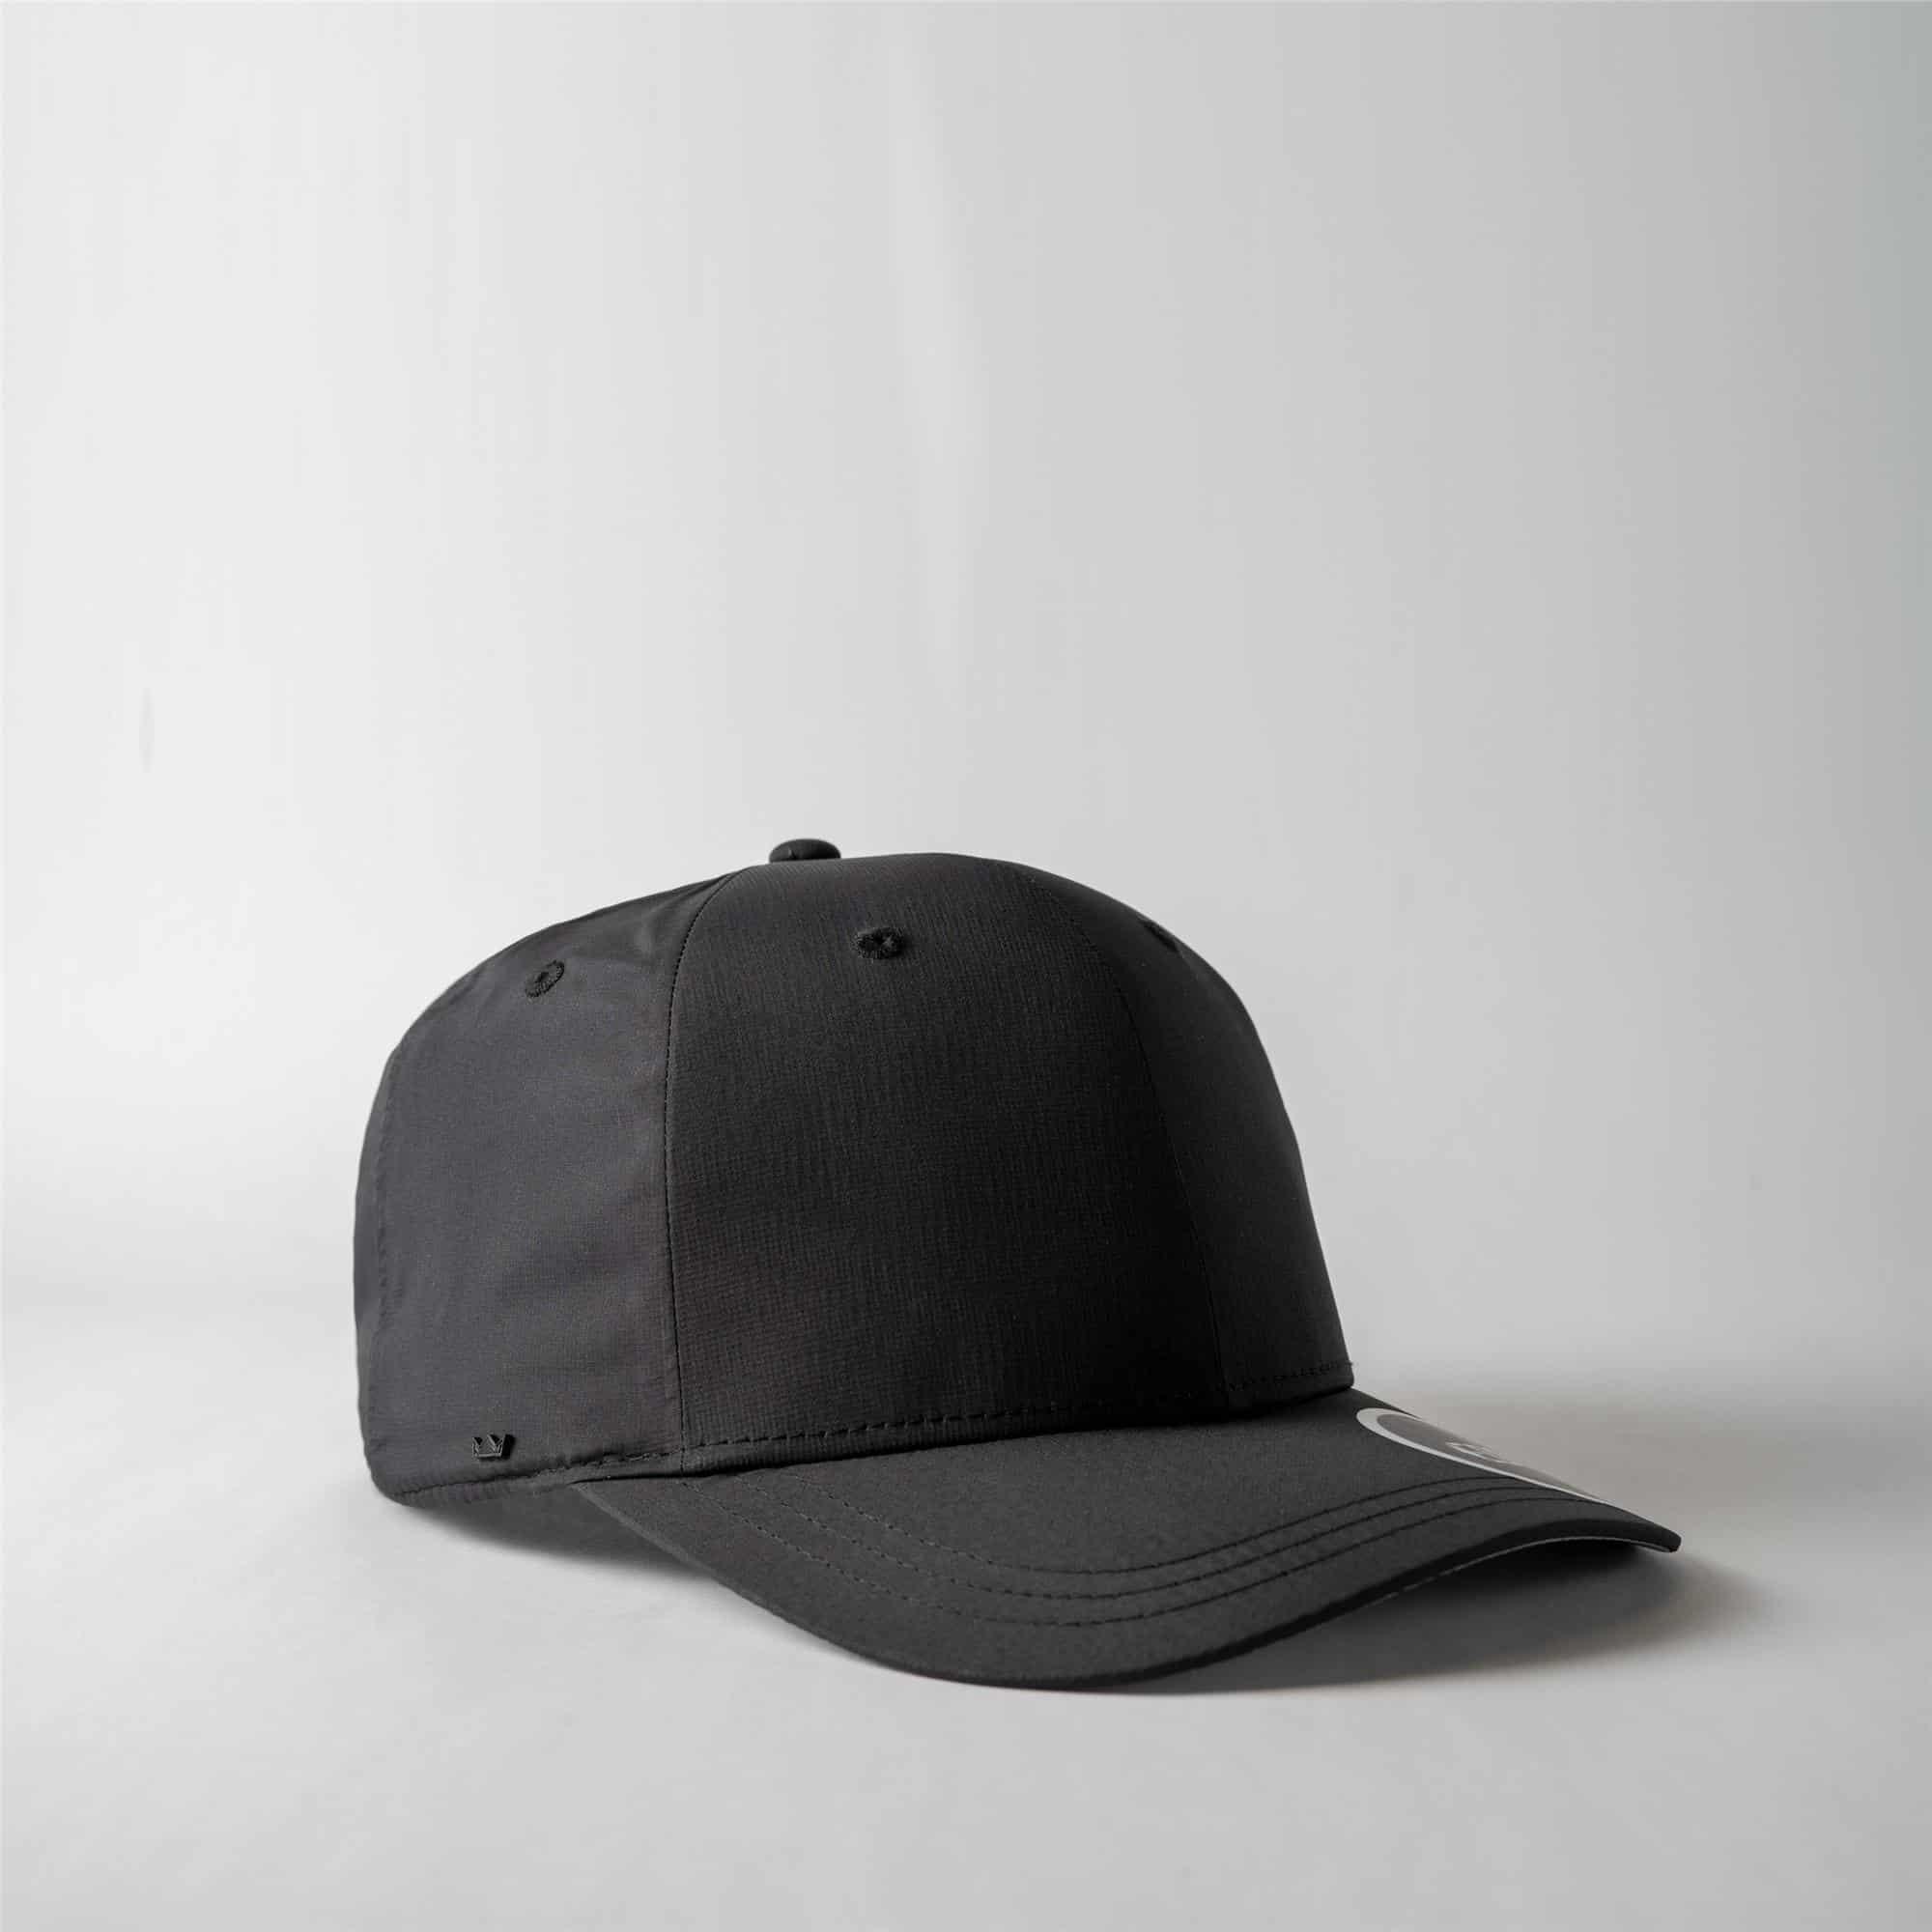 U15801 Edge Bonded 6 Panel Adjustable Baseball Headwear and Accessories